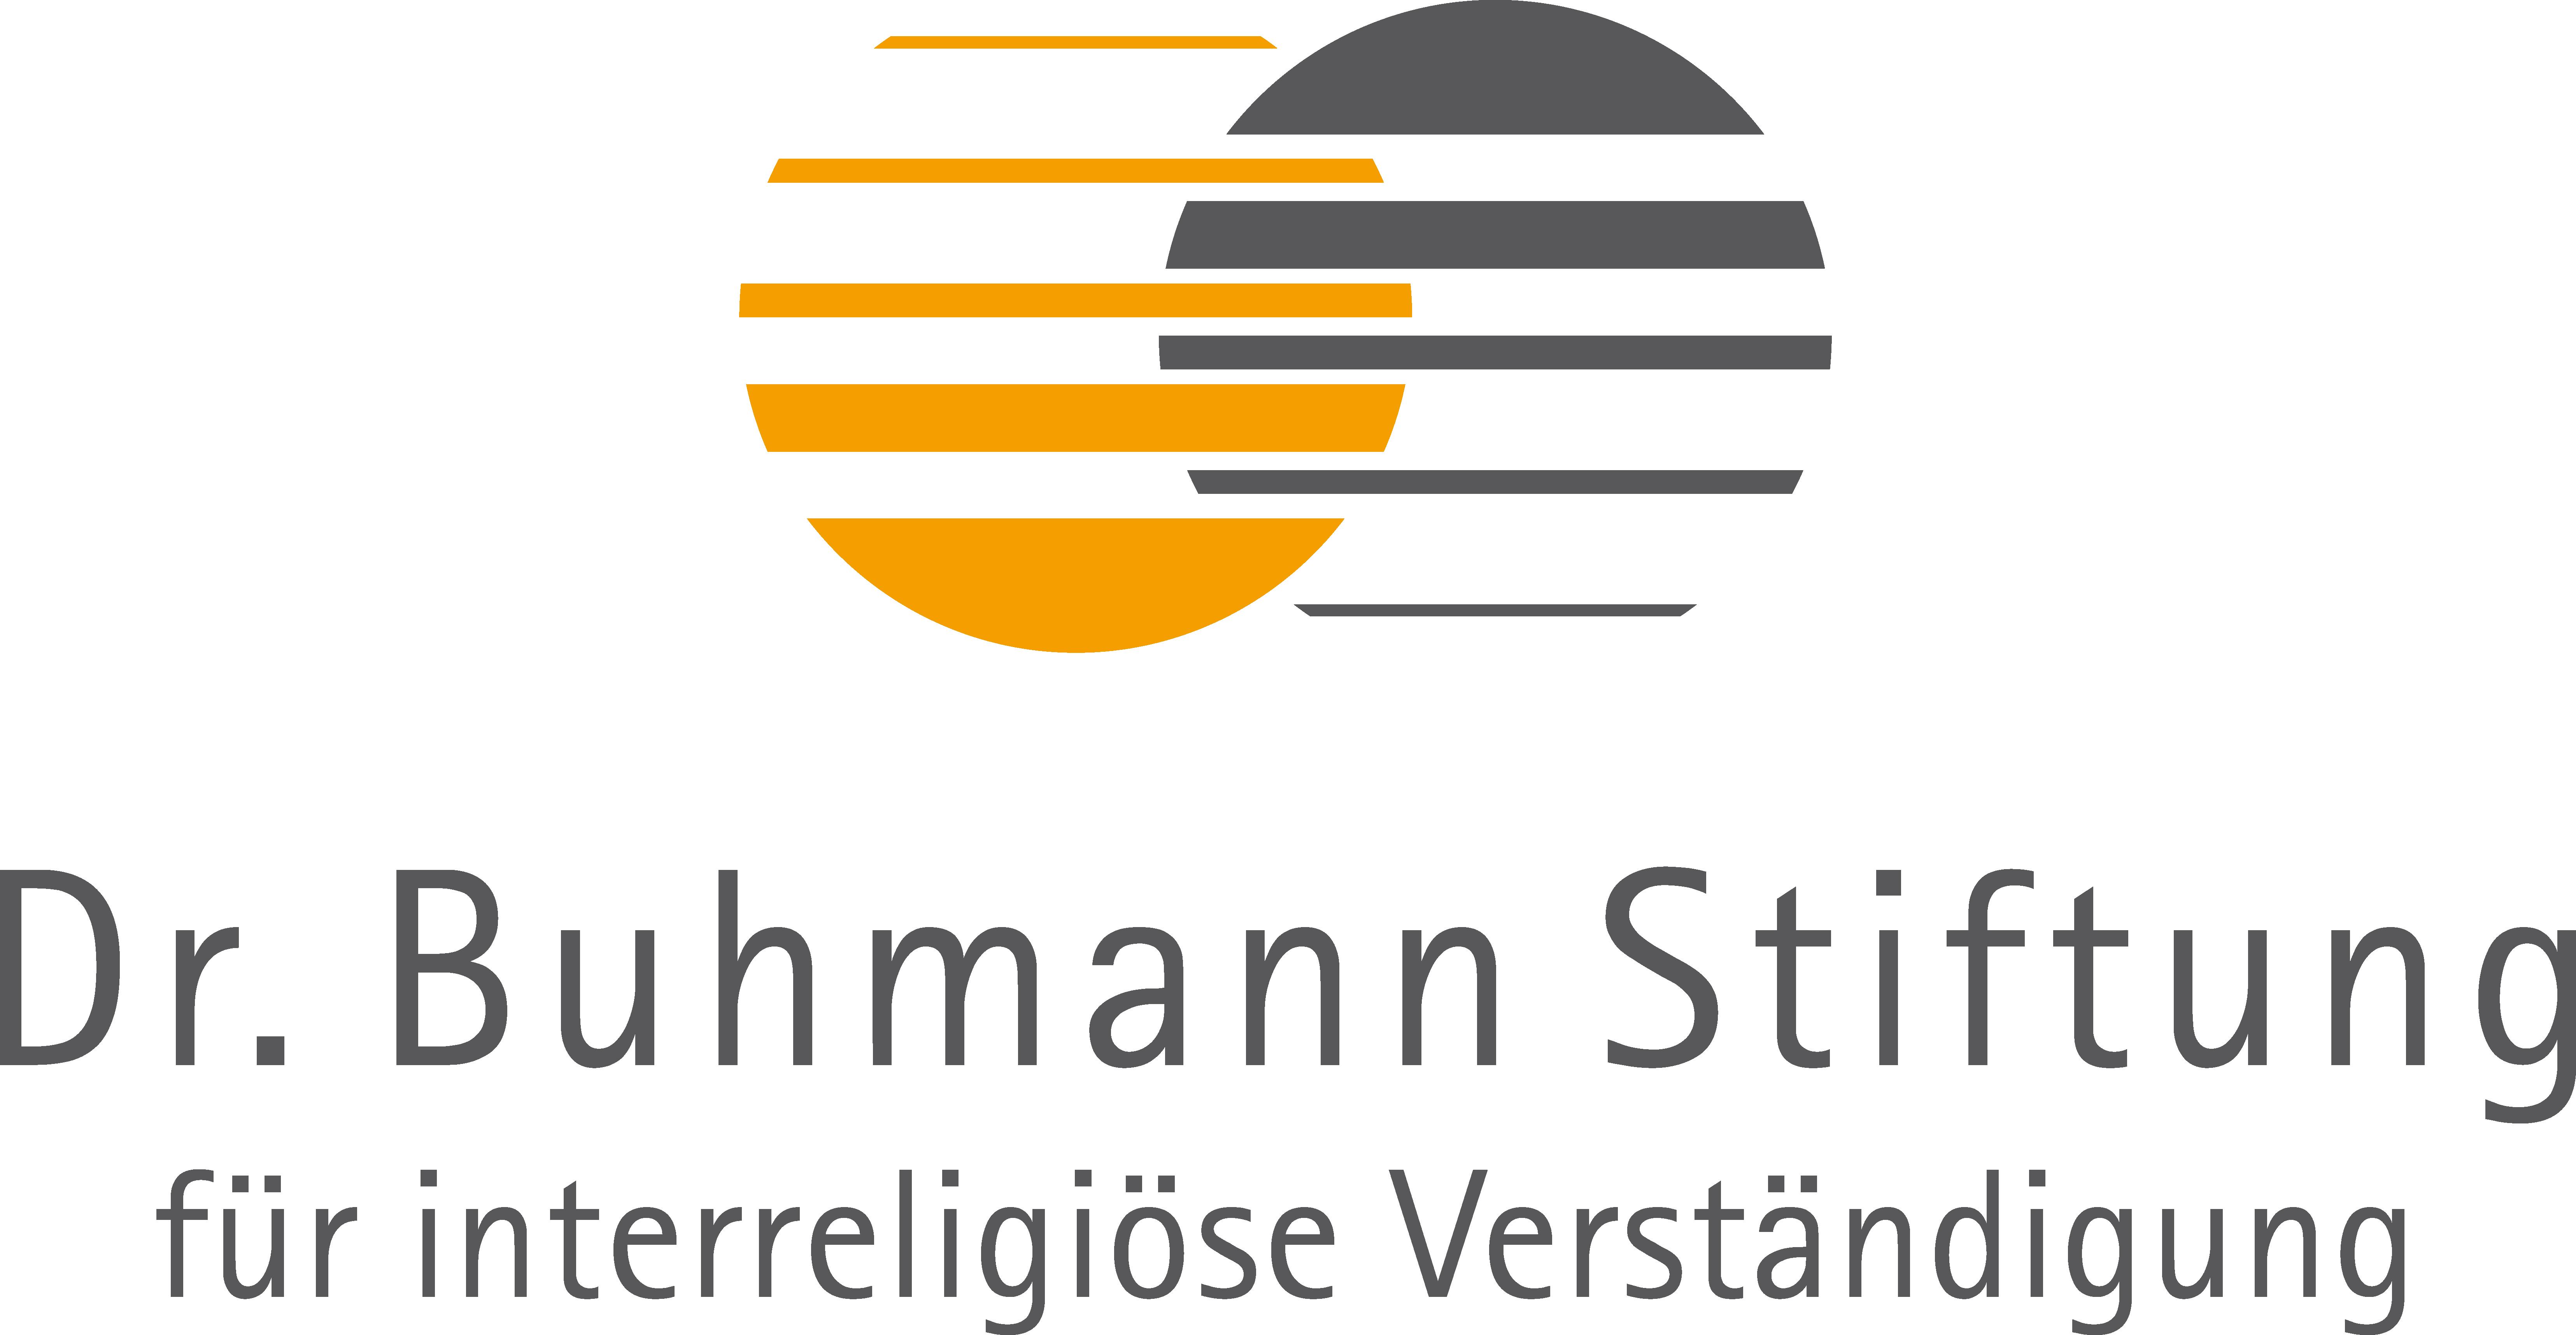 Dr. Buhmann Stiftung